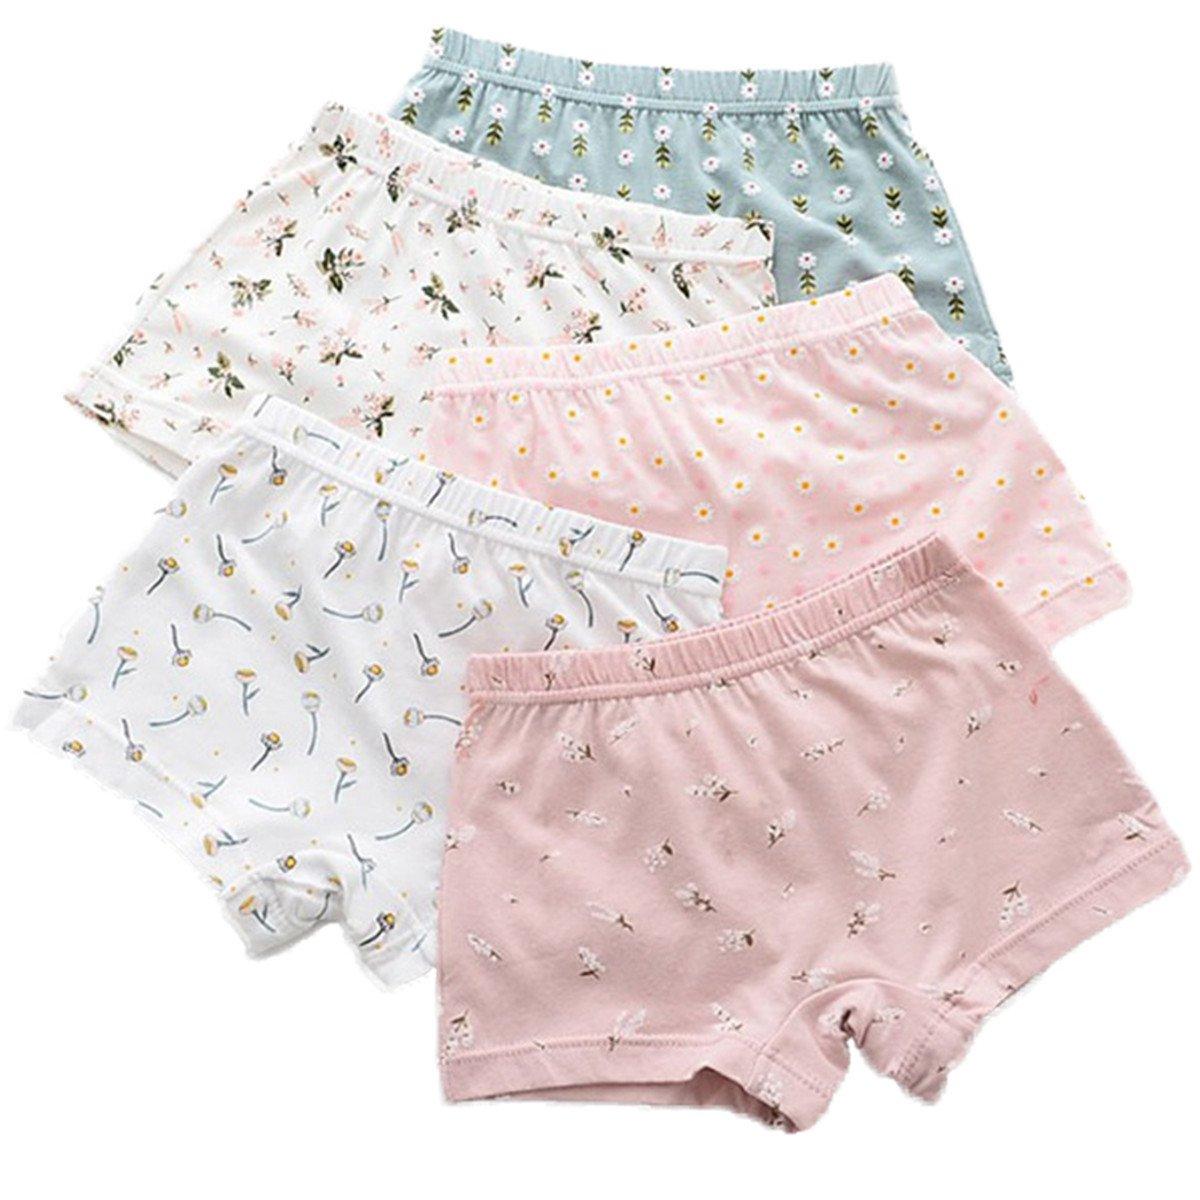 FAIRYRAIN Little Girls Kids 5Pcs Comfortable Cute Cartoon Boy-Leg Knickers Boyshort Underwear Boxers Briefs Panties